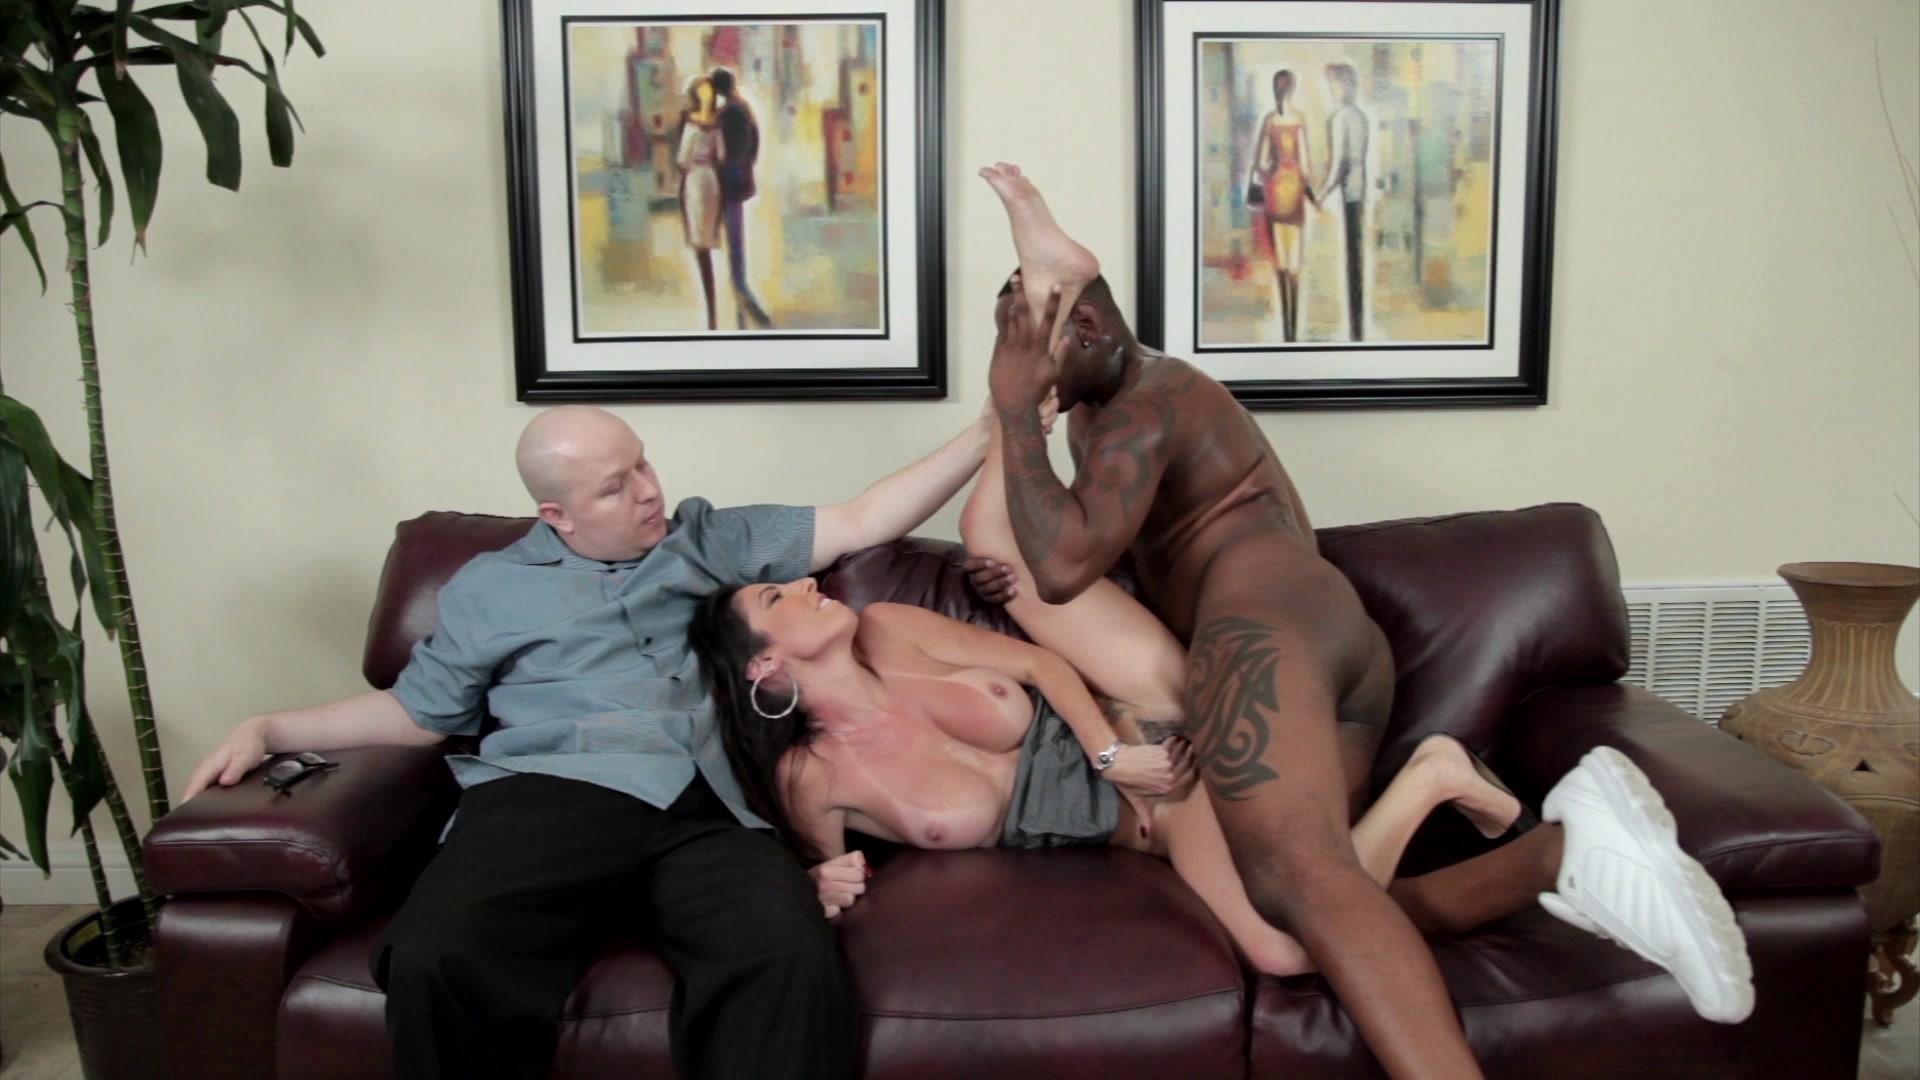 Dava foxx cuckold her husband with big black dick therapist